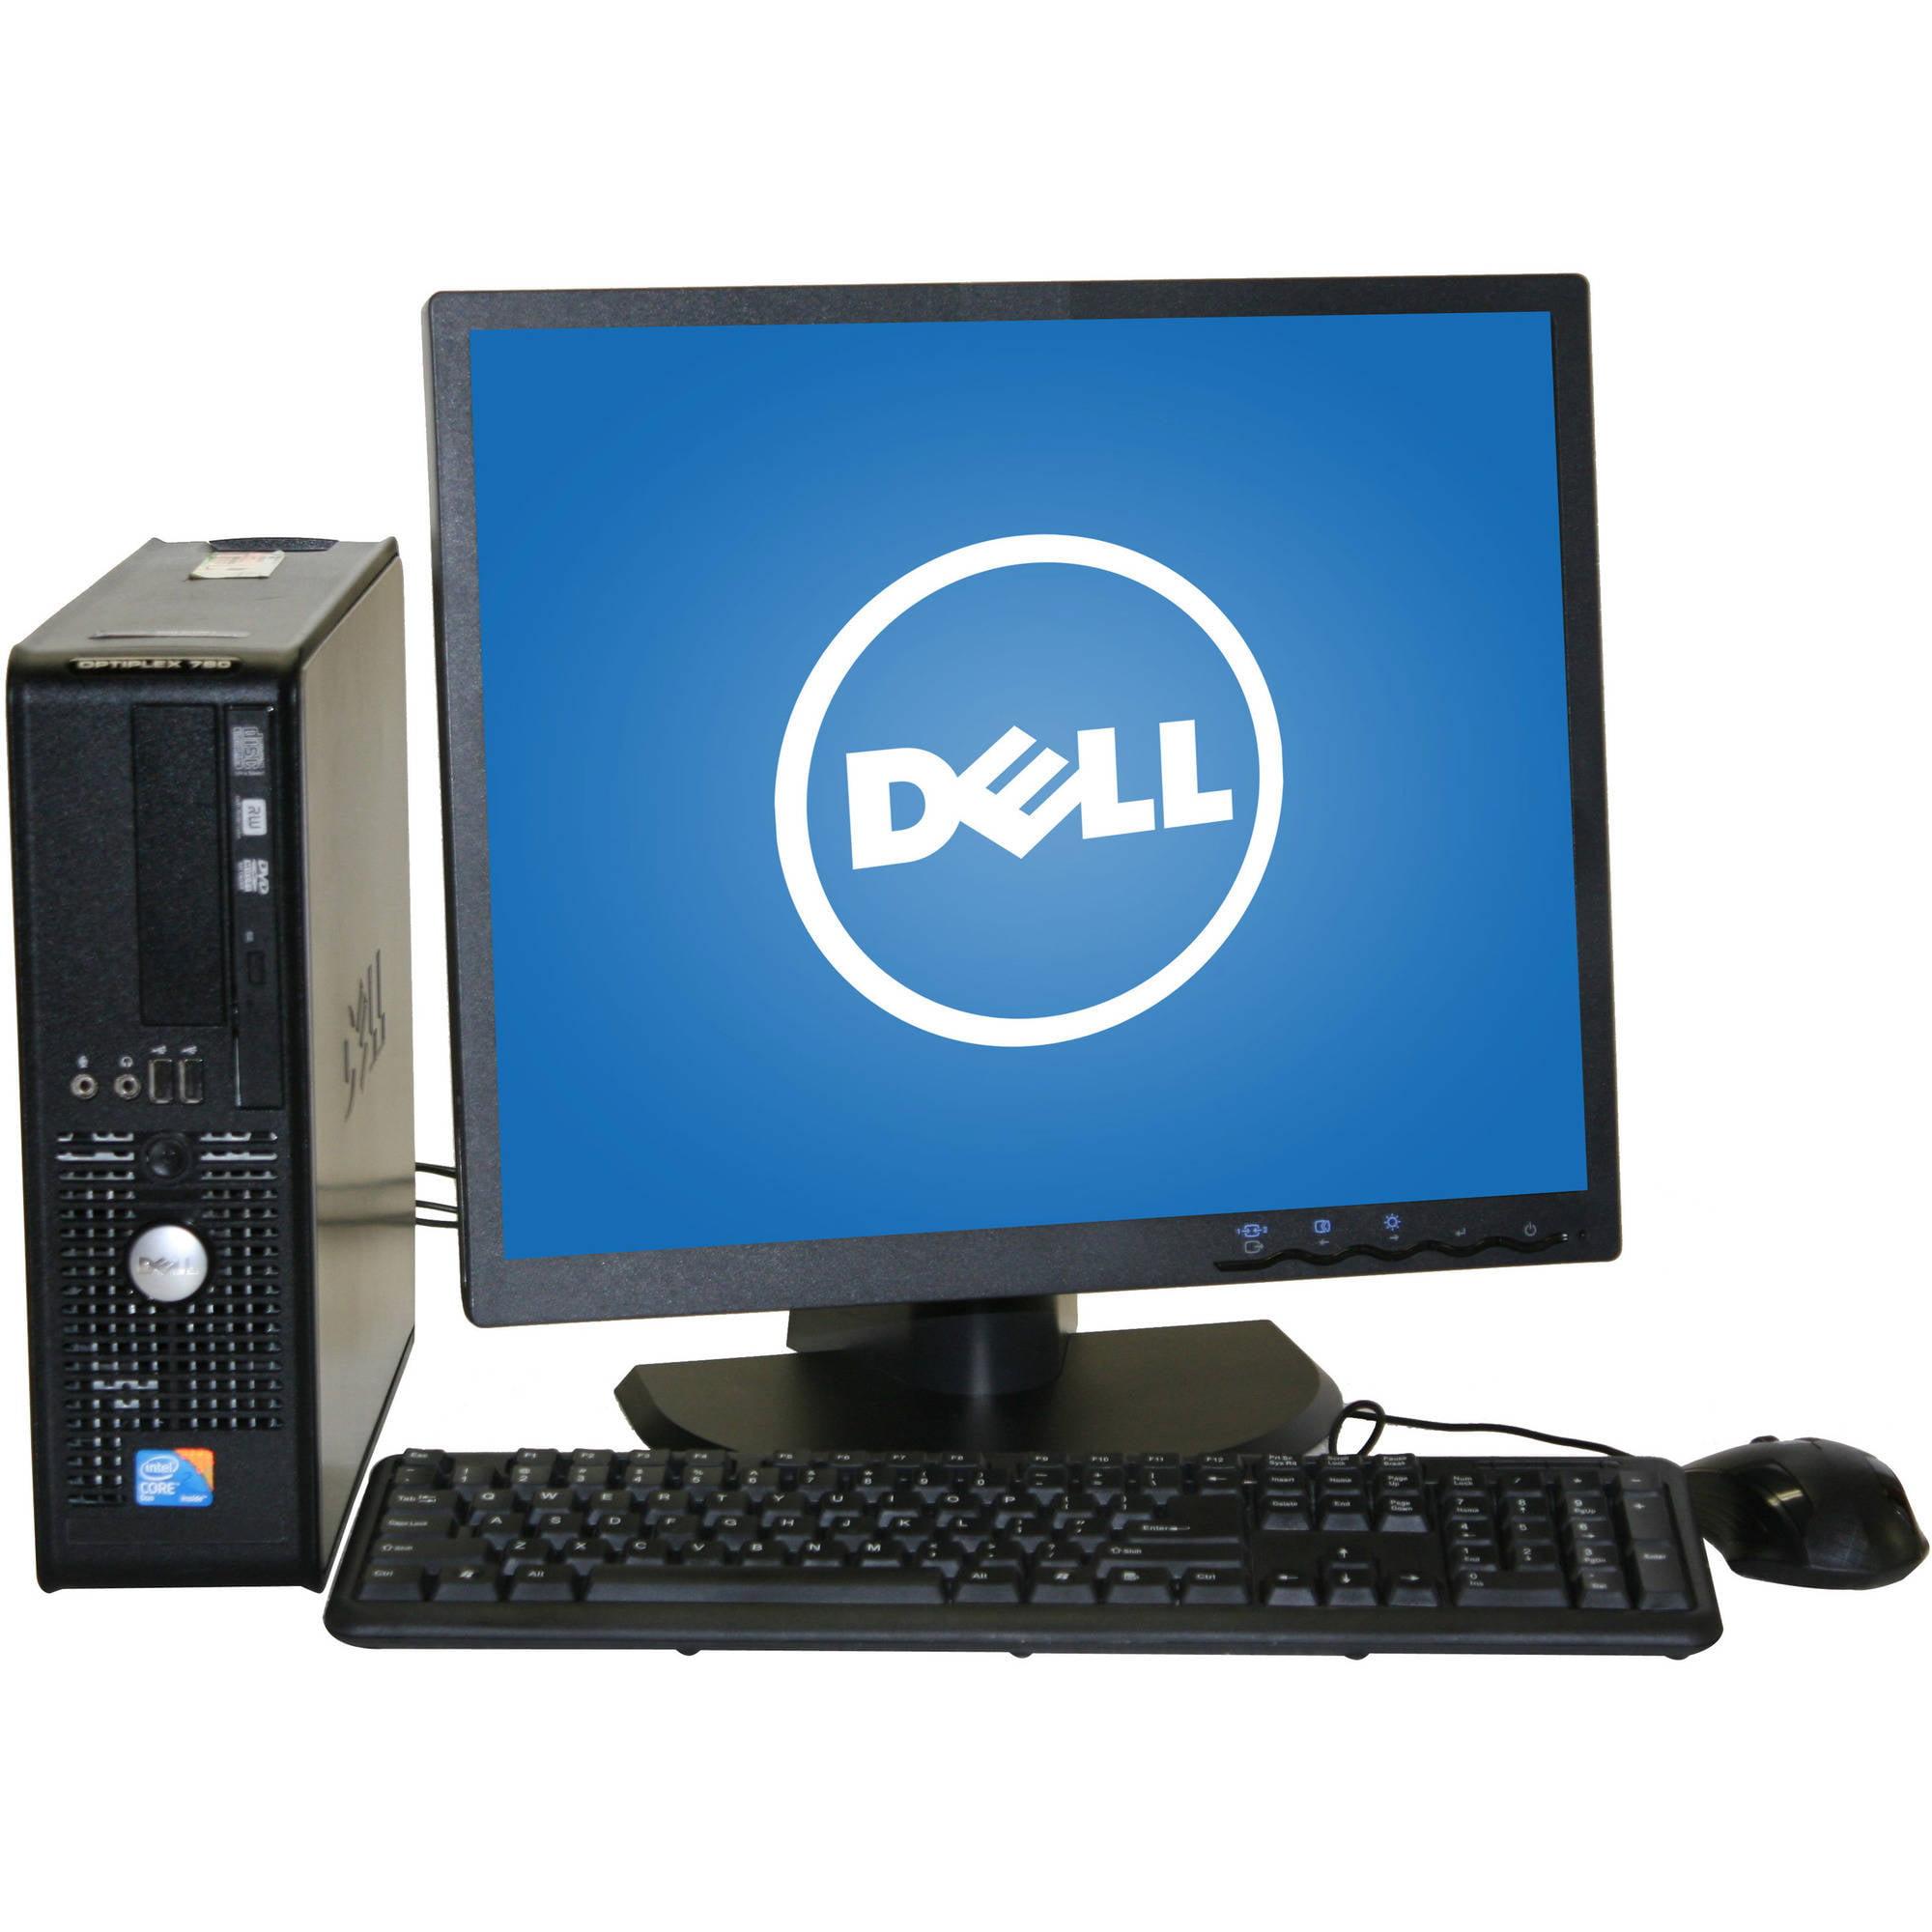 "Refurbished Dell 780 Desktop PC with Intel Core 2 Duo Processor, 8GB Memory, 19"" Monitor, 1TB Hard Drive and Windows 10 Pro"